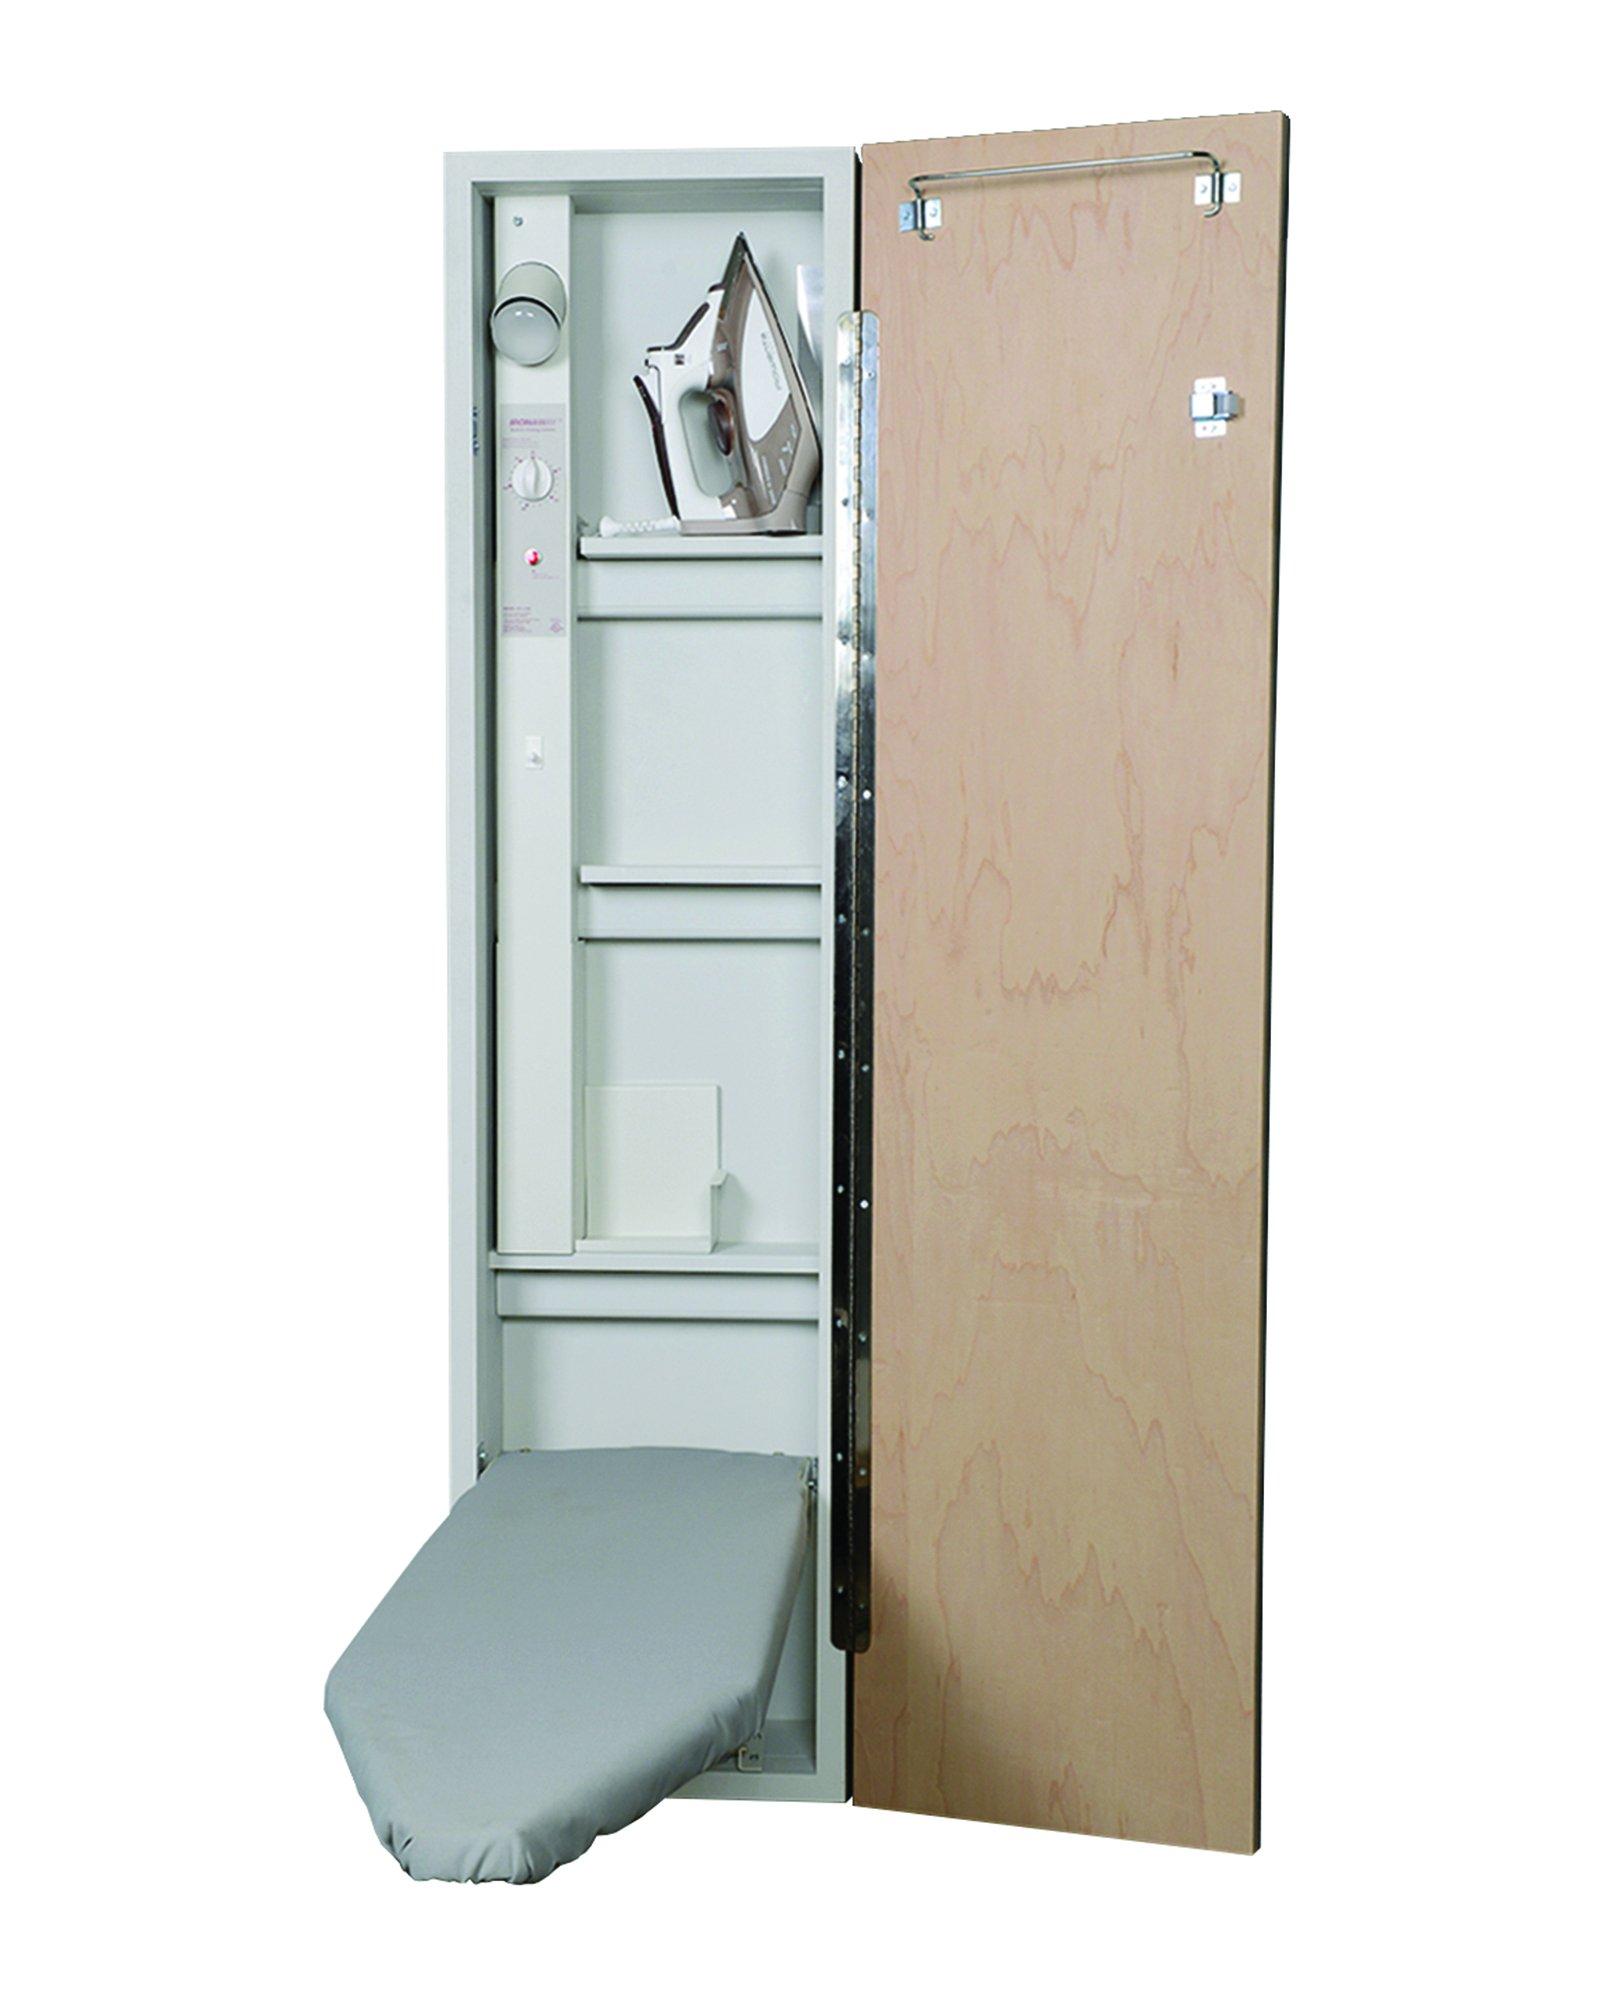 Iron-A-Way Premium Electric Ironing Center, Flat Maple Door